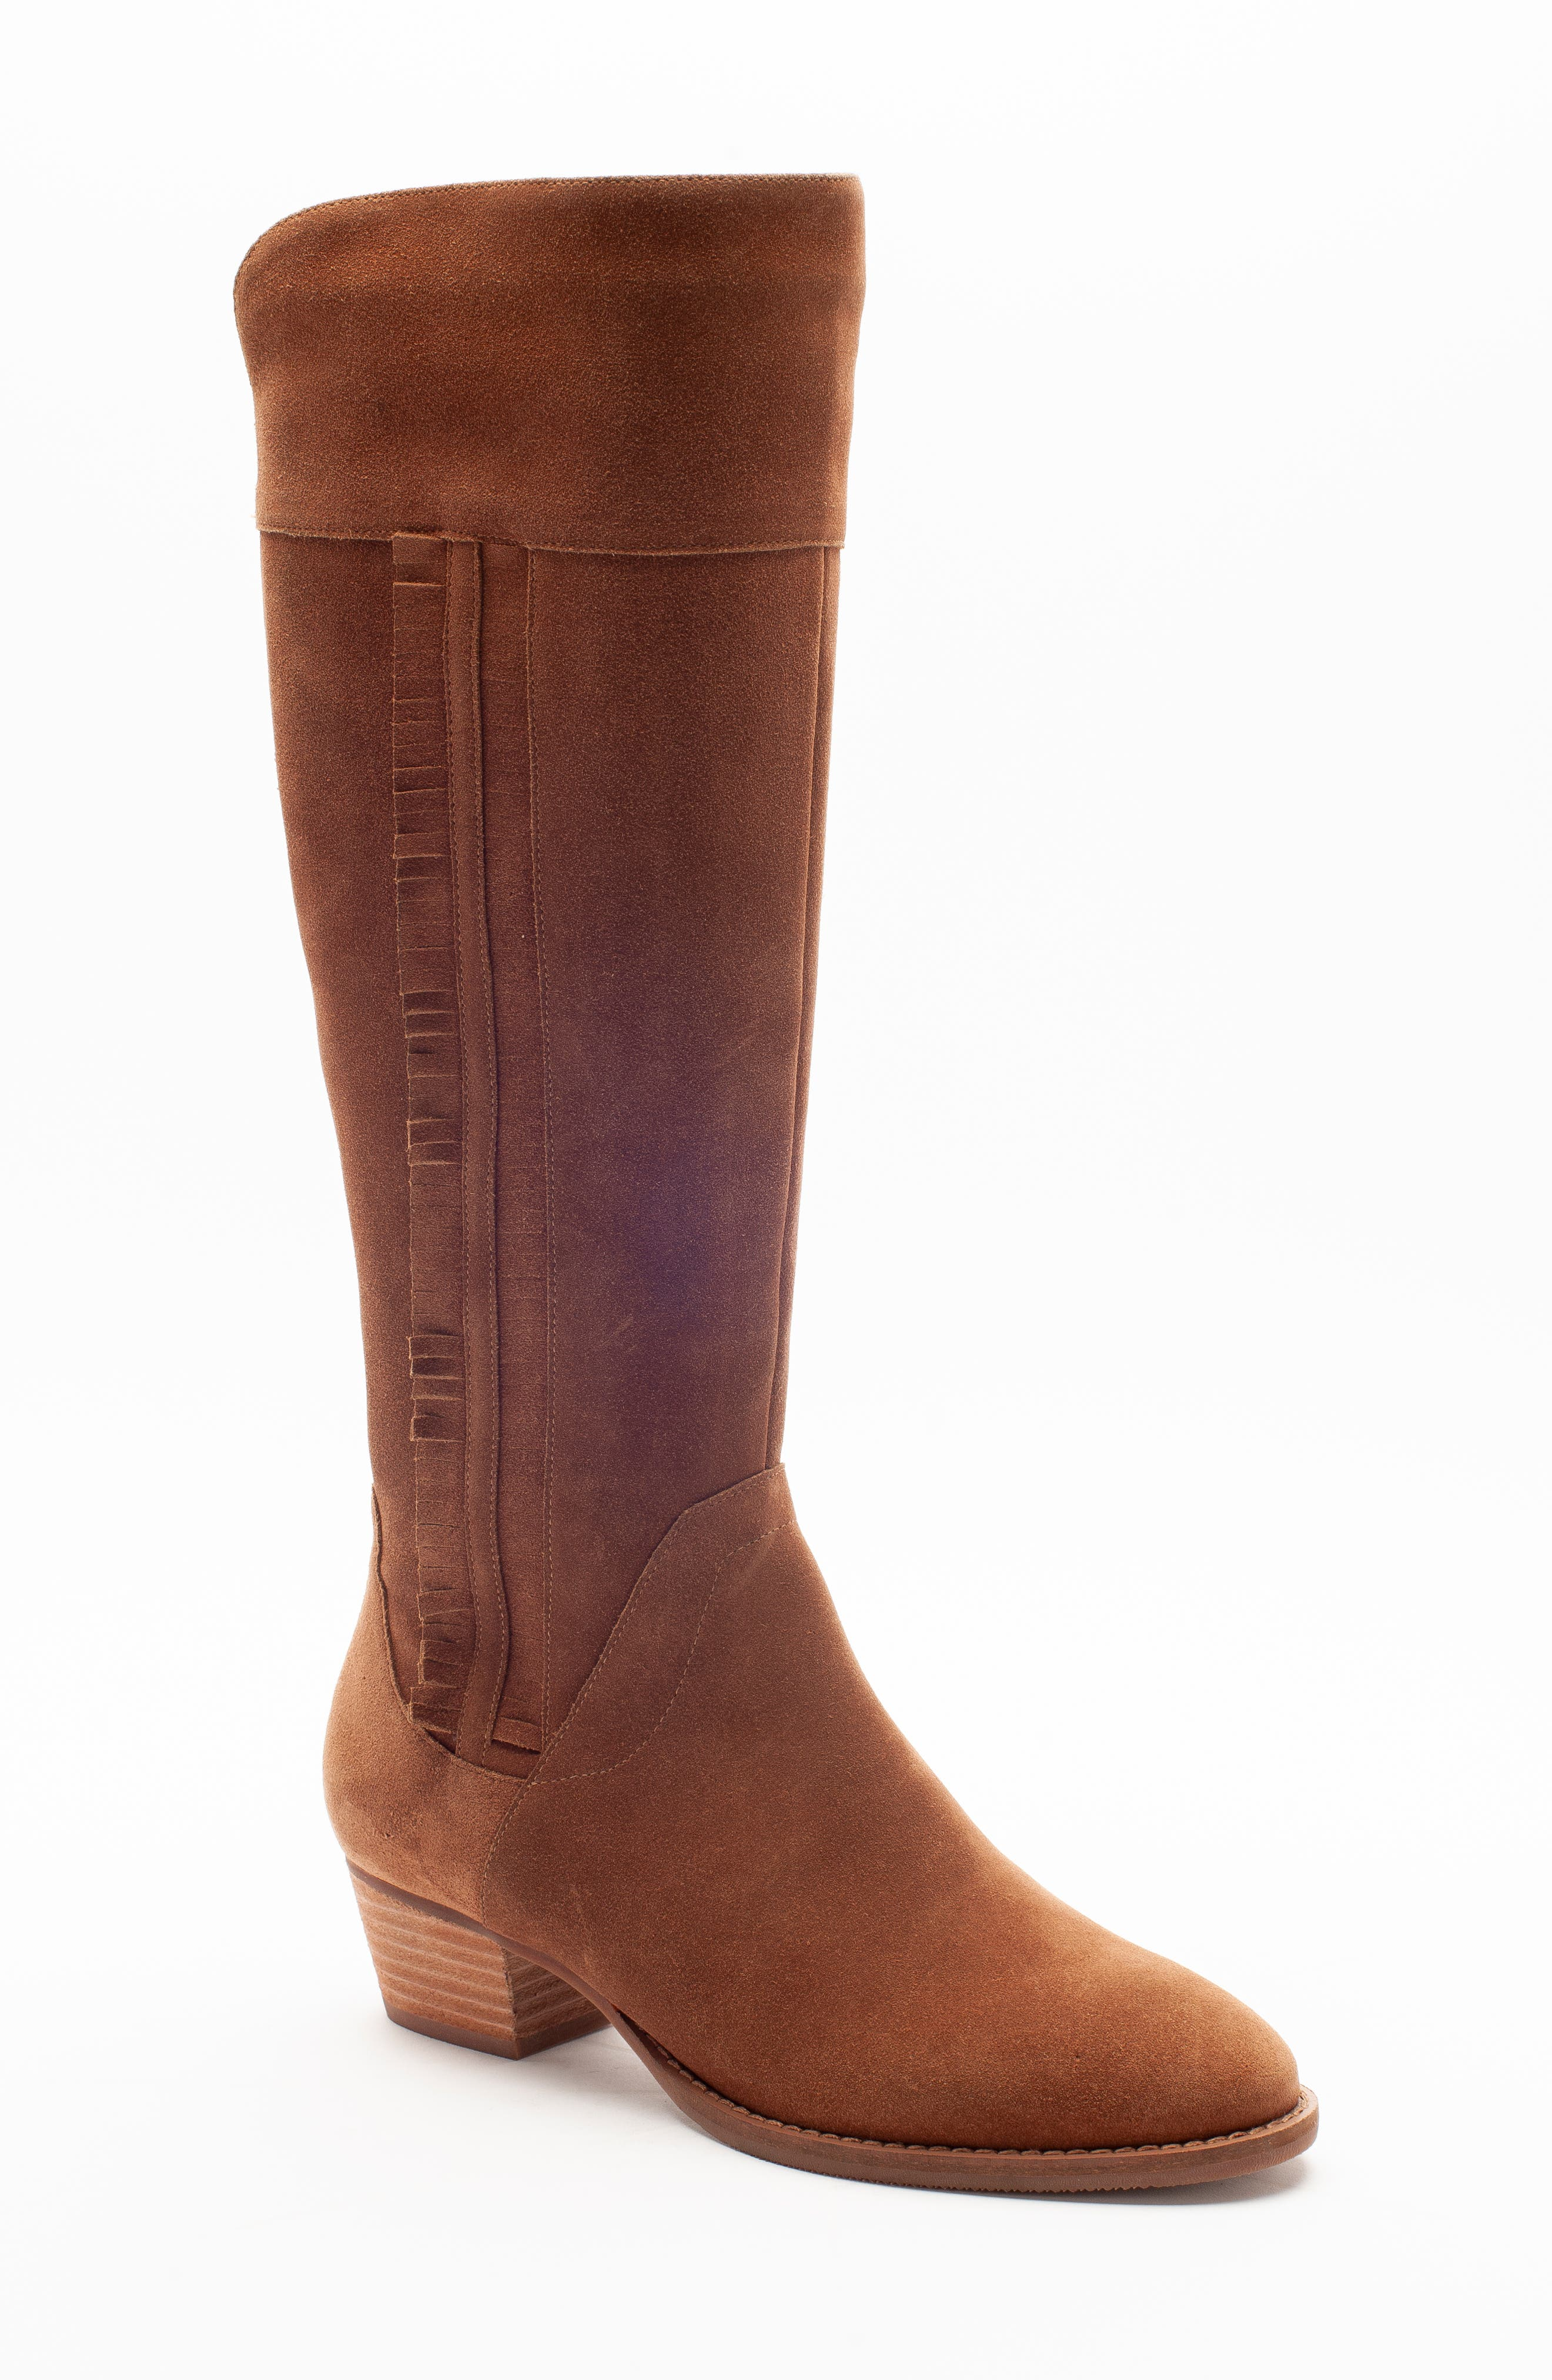 Nestle Waterproof Knee High Boot,                         Main,                         color, CHESTNUT SUEDE